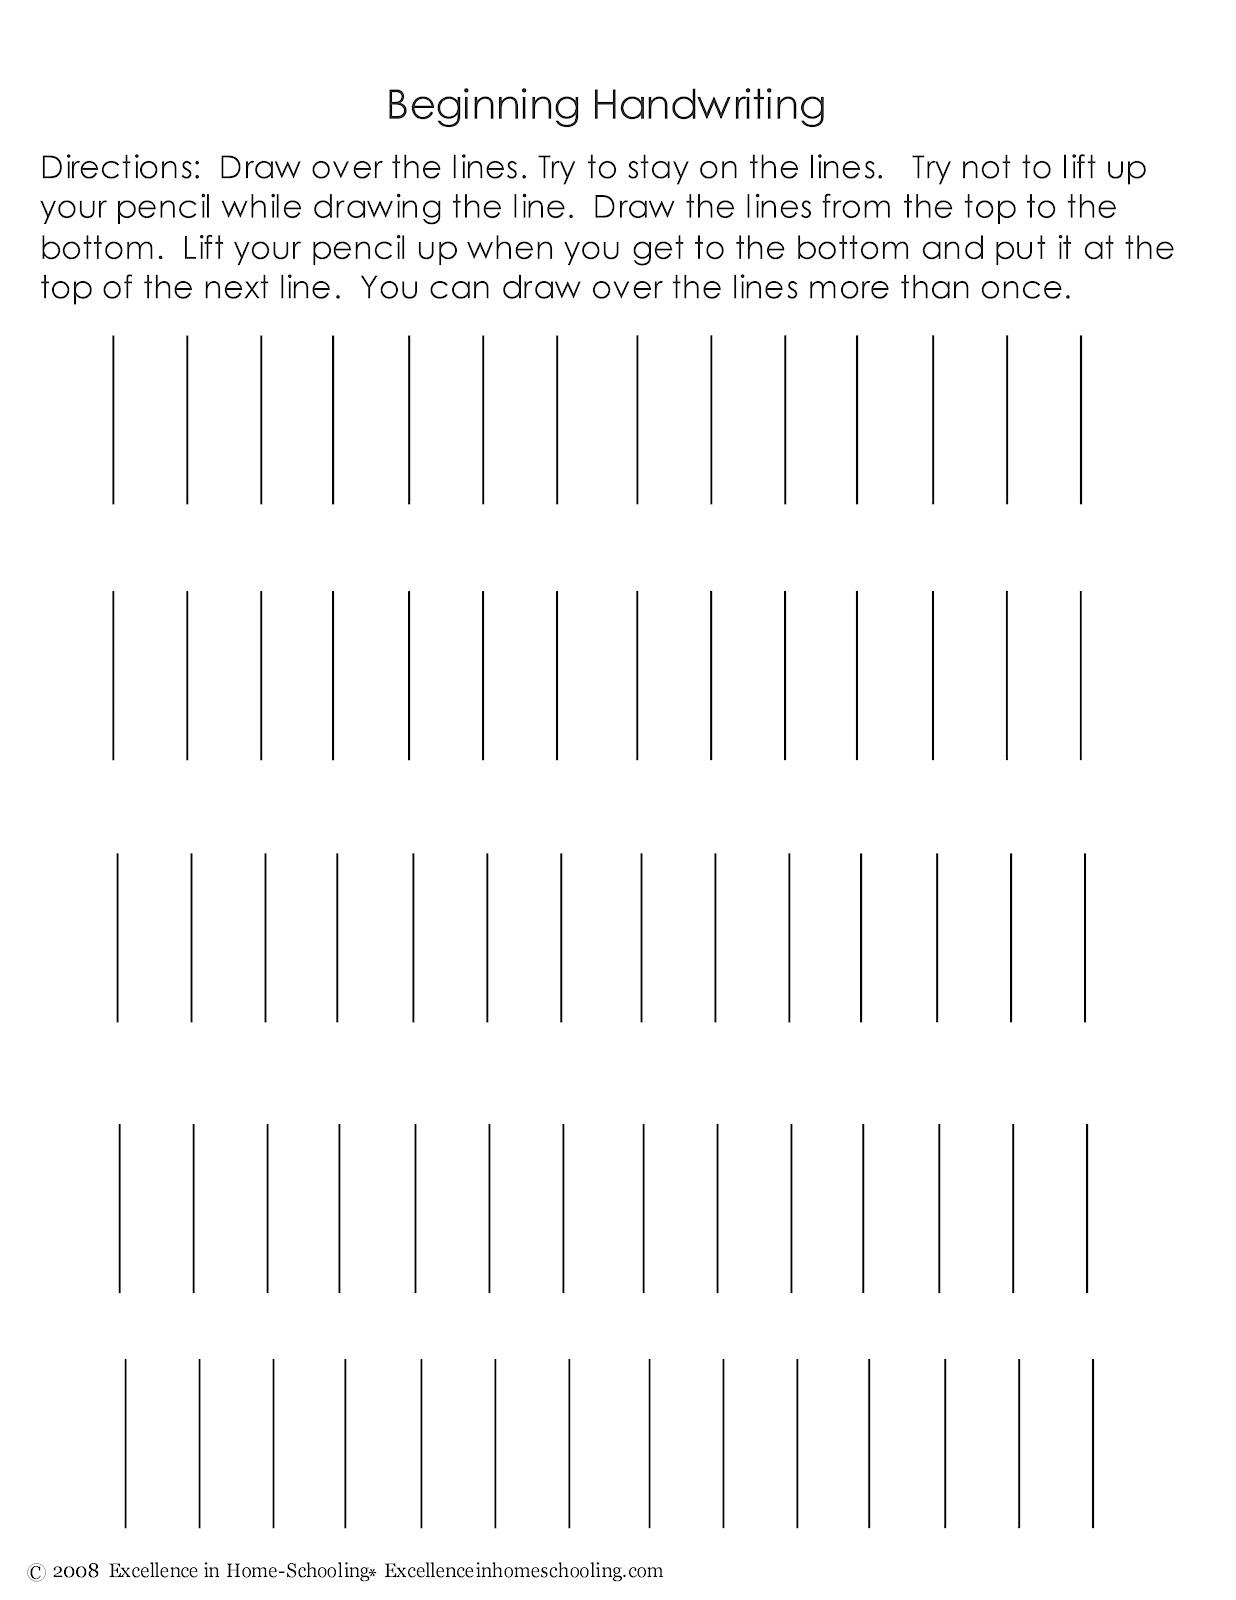 laura 39 s frayed knot beginning handwriting worksheets. Black Bedroom Furniture Sets. Home Design Ideas